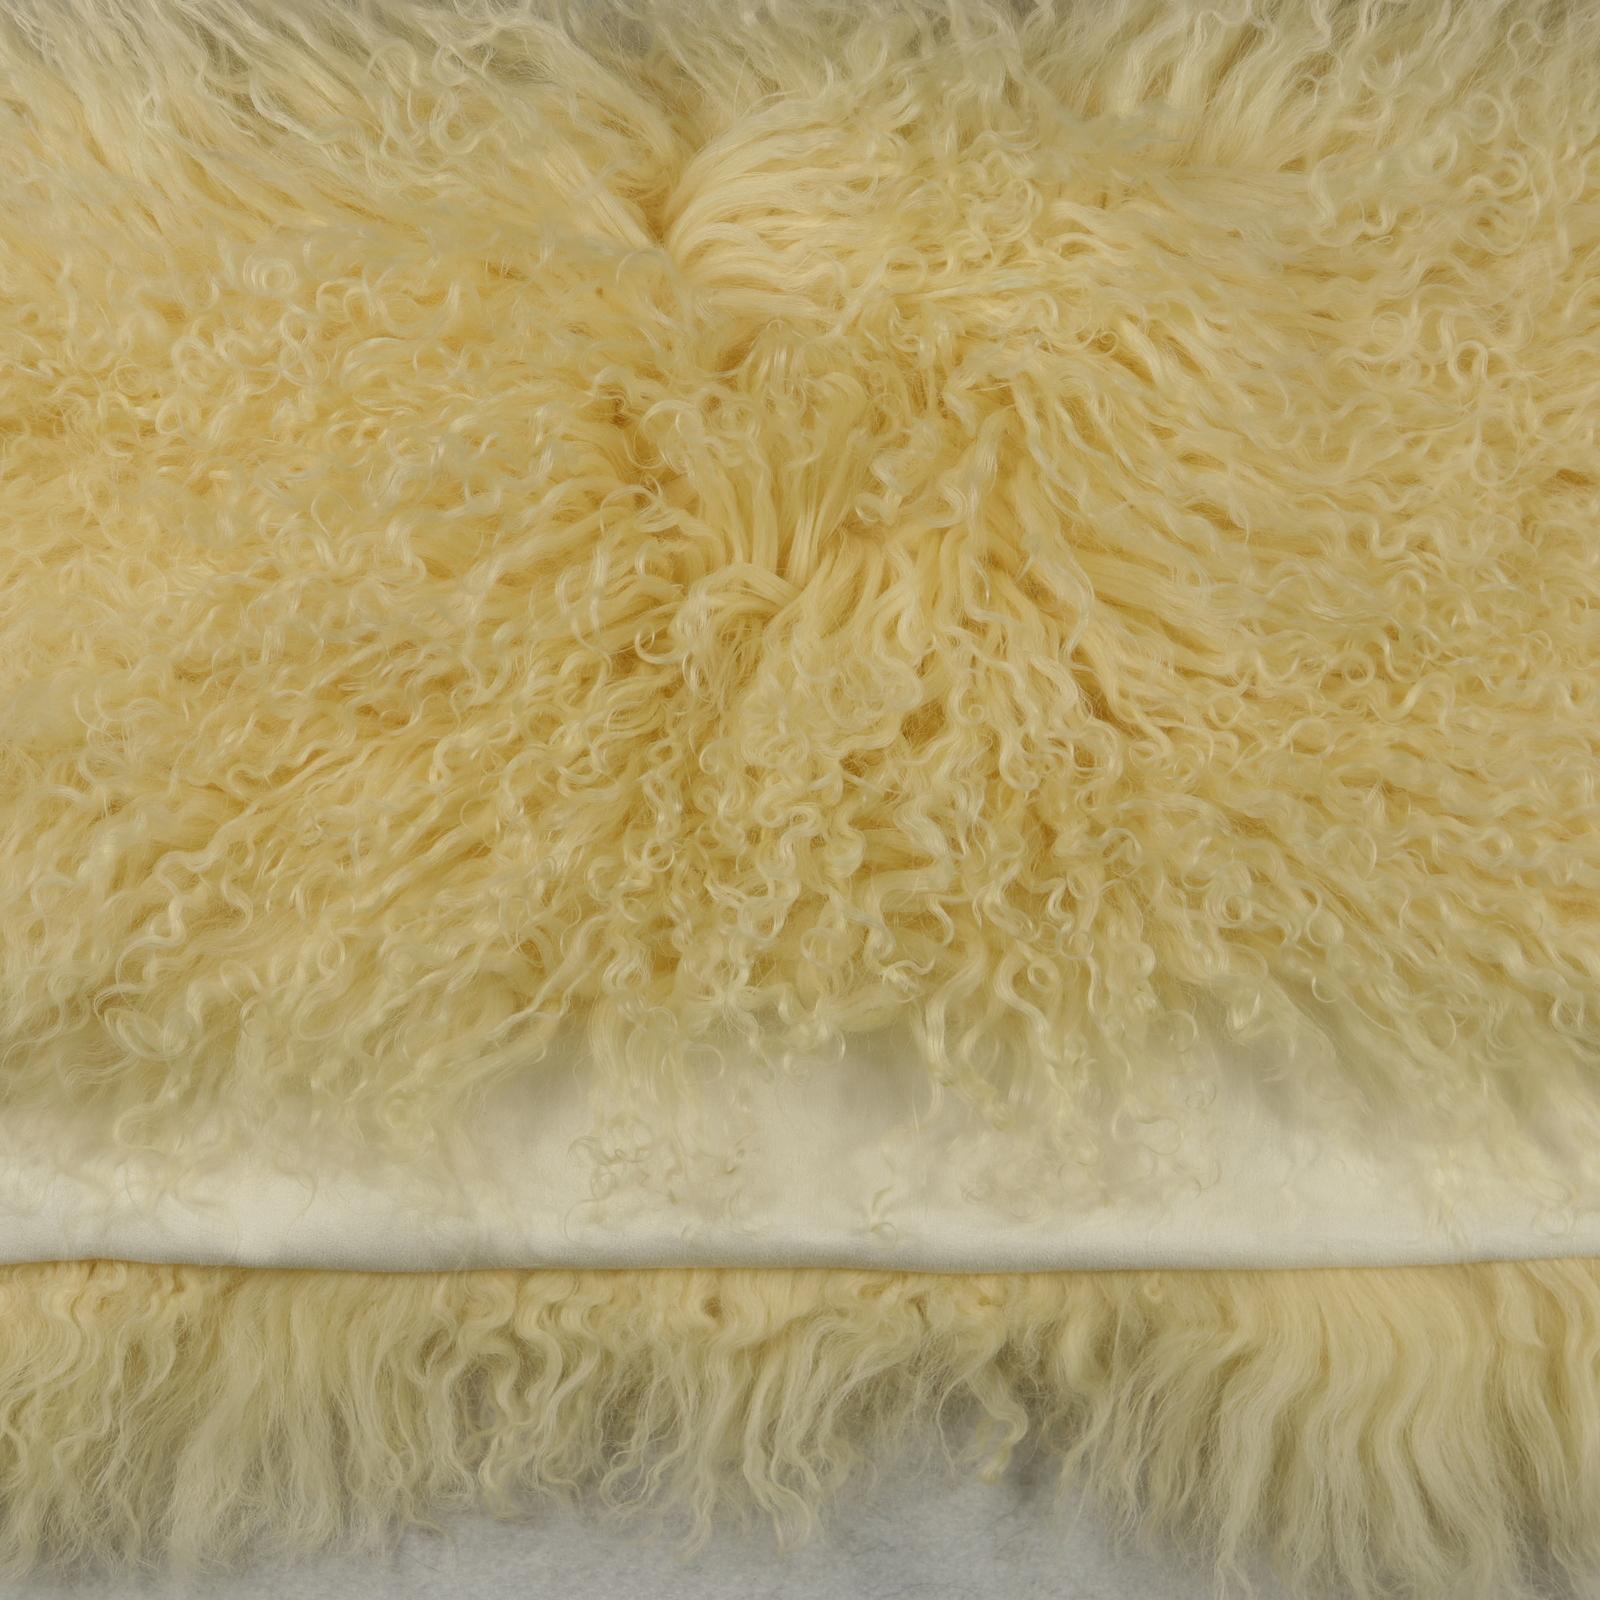 50x50cm Real Golden Beige Mongolian Tibetan Lamb Fur Wool Pillow Cushion Cover